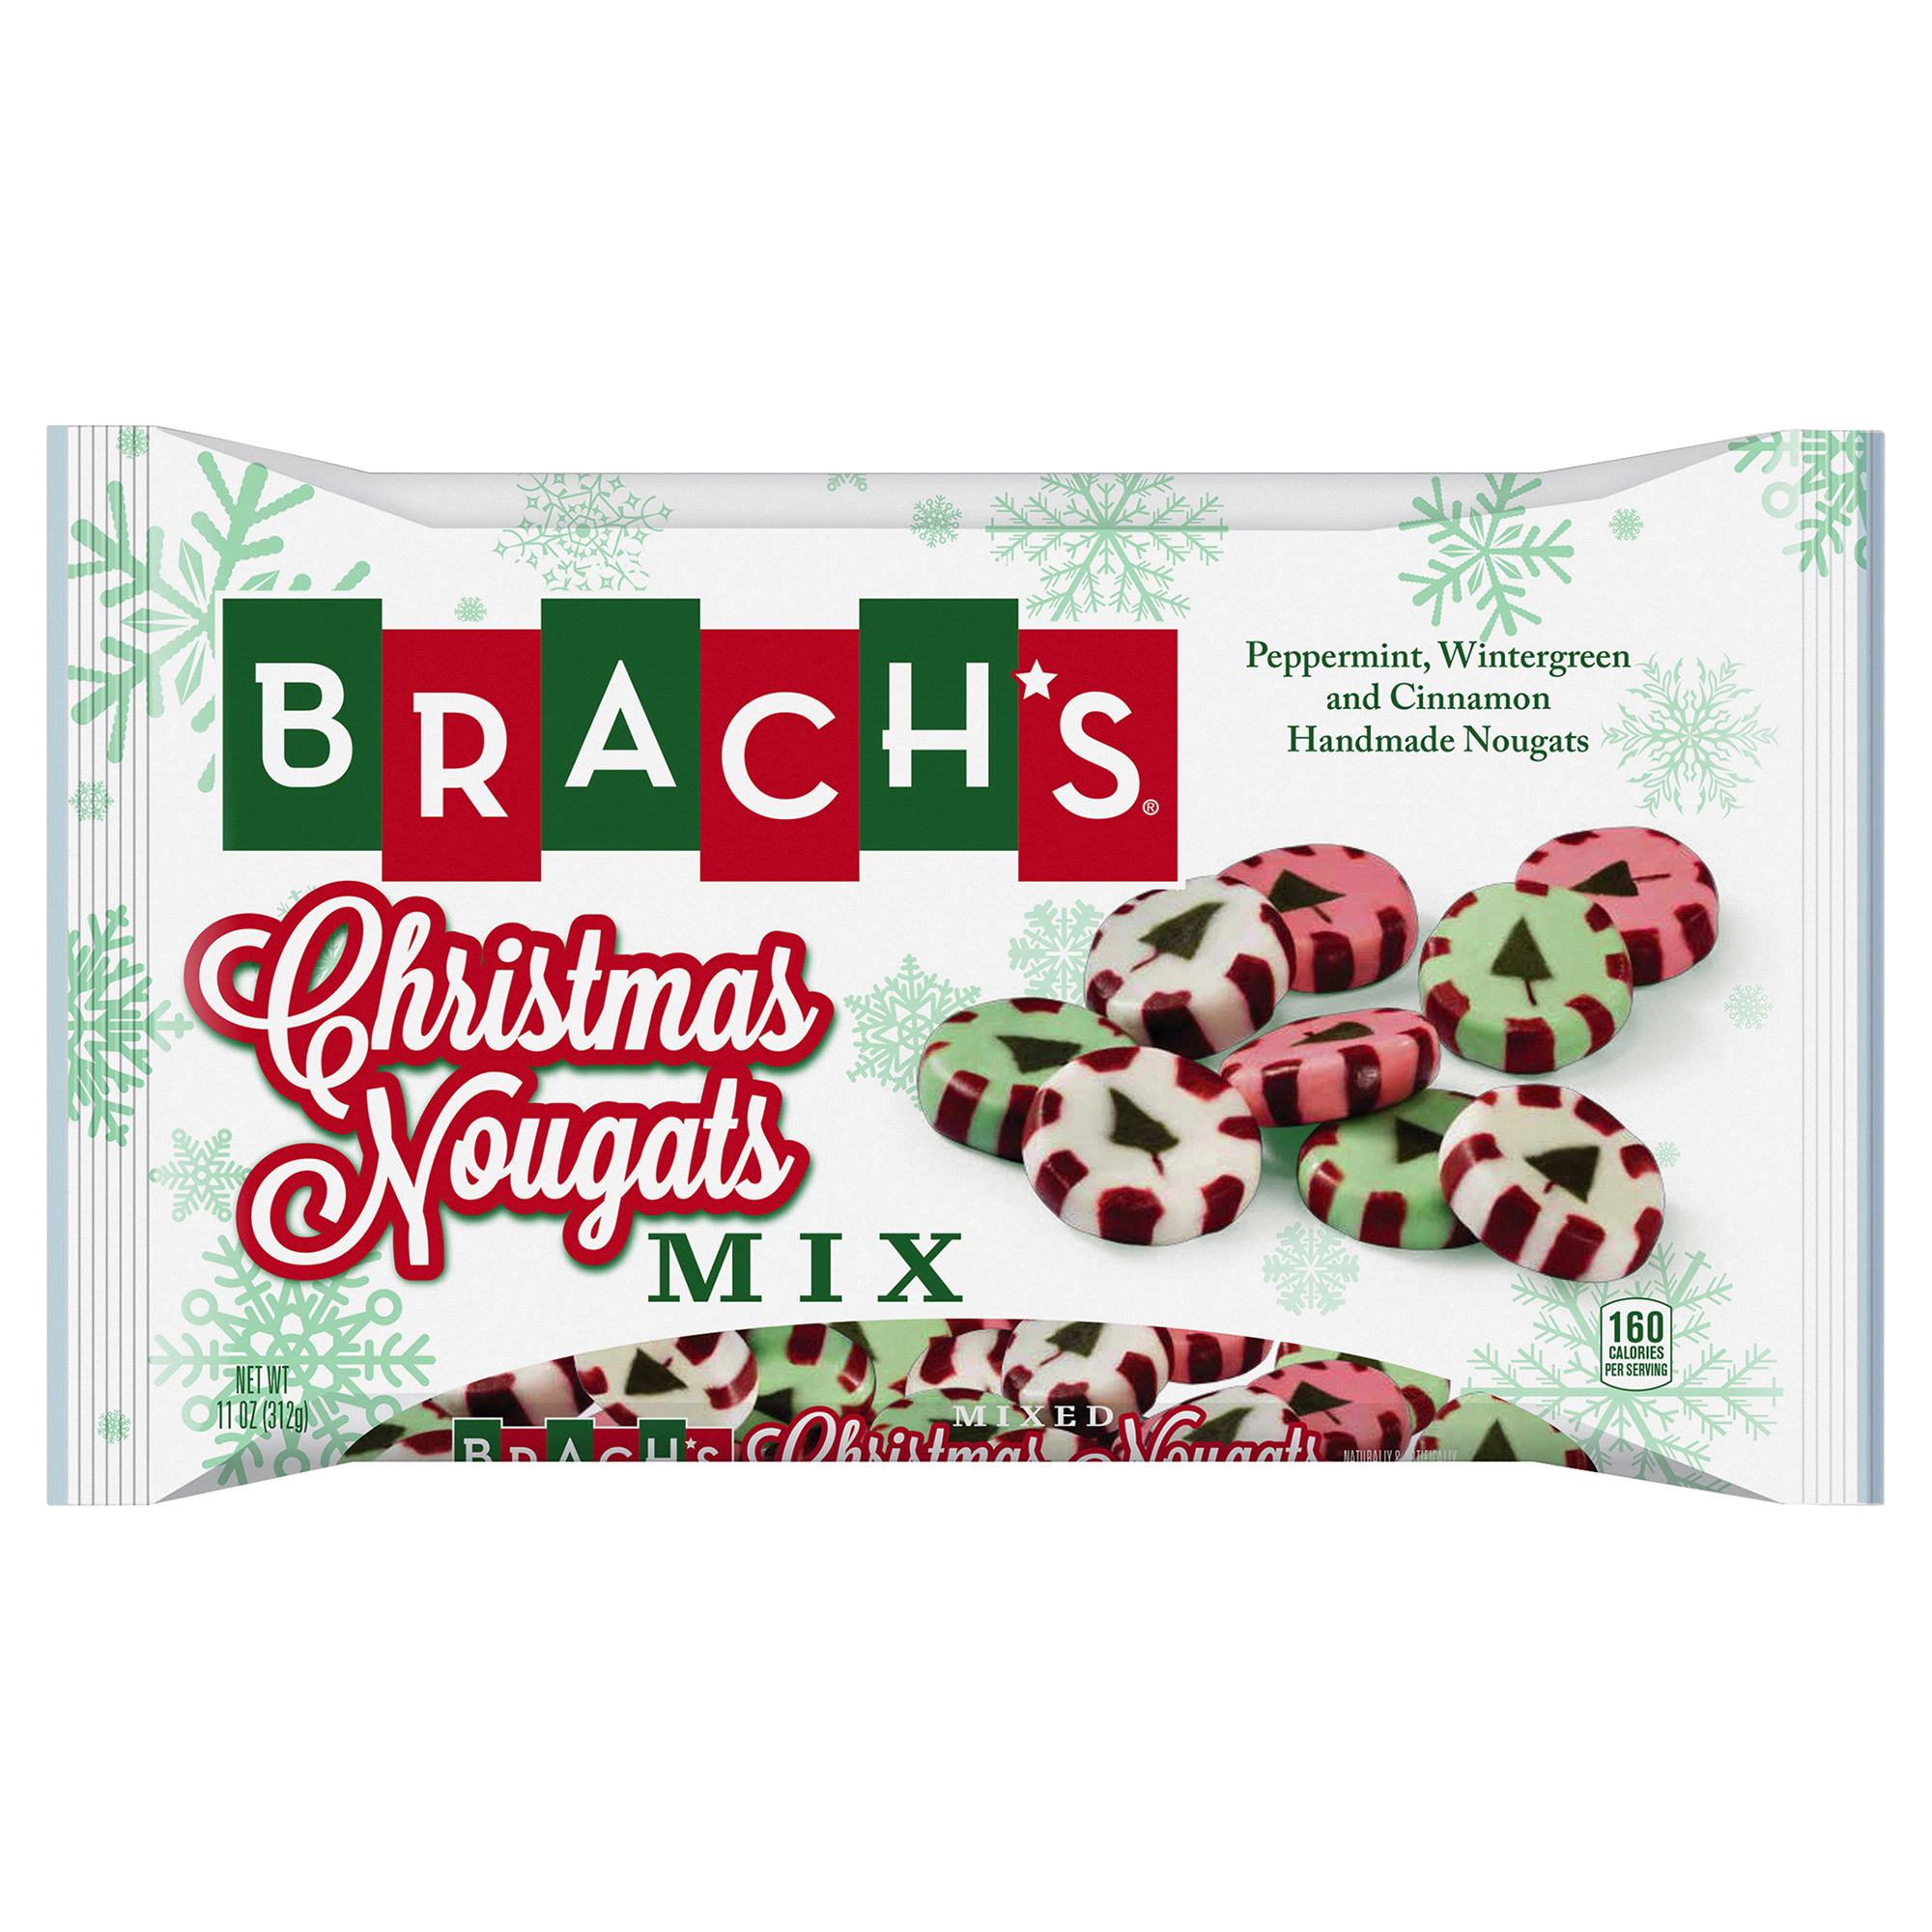 Brachs Christmas Nougat Mix | Meijer.com